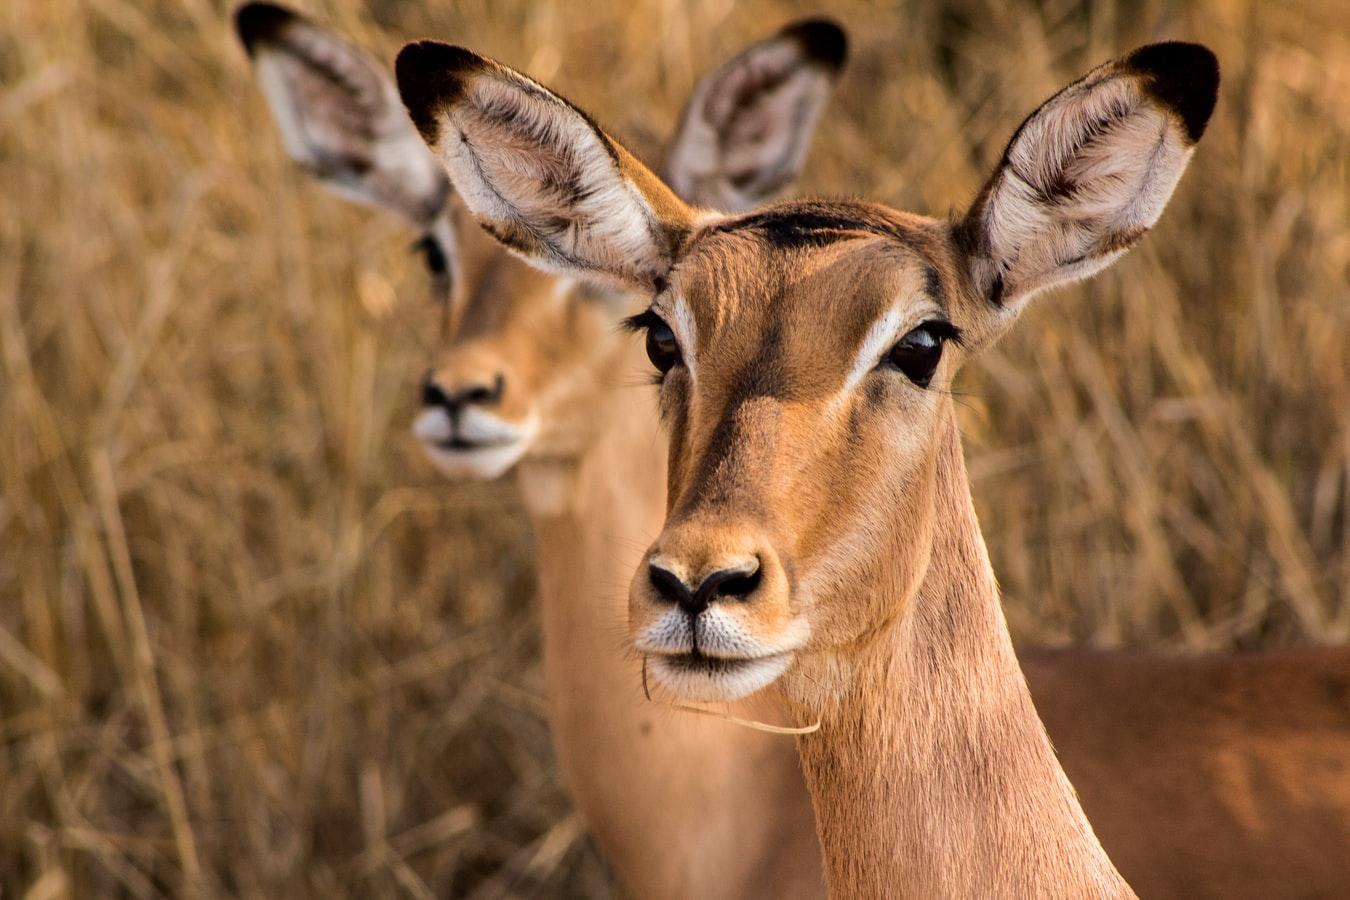 Zwei weibliche Impala-Antilopen in Kenia